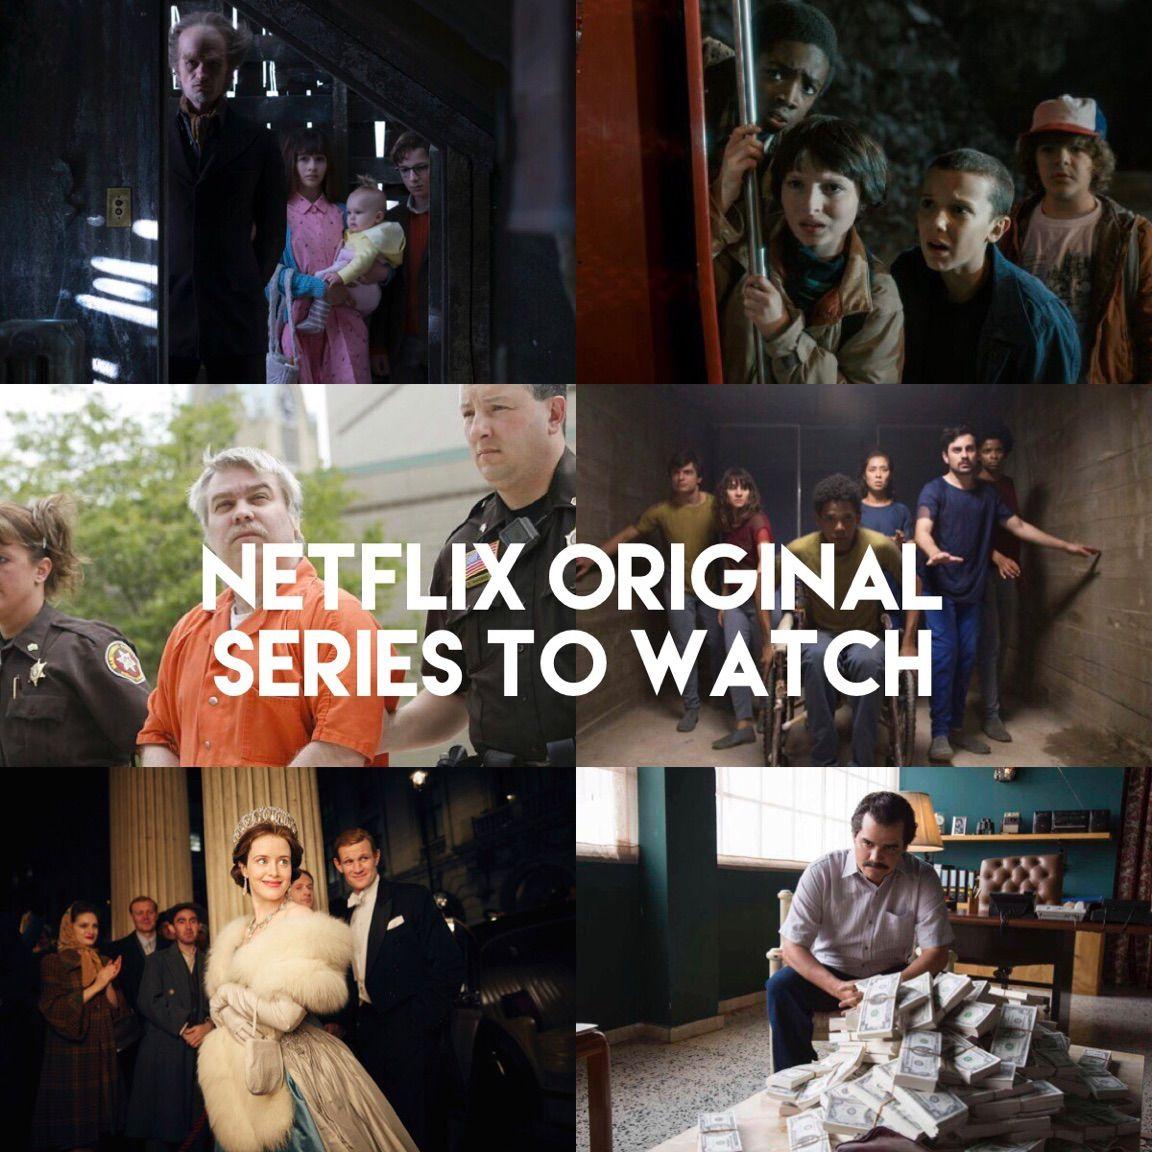 Netflix Original Series You Should Be Watching Netflix